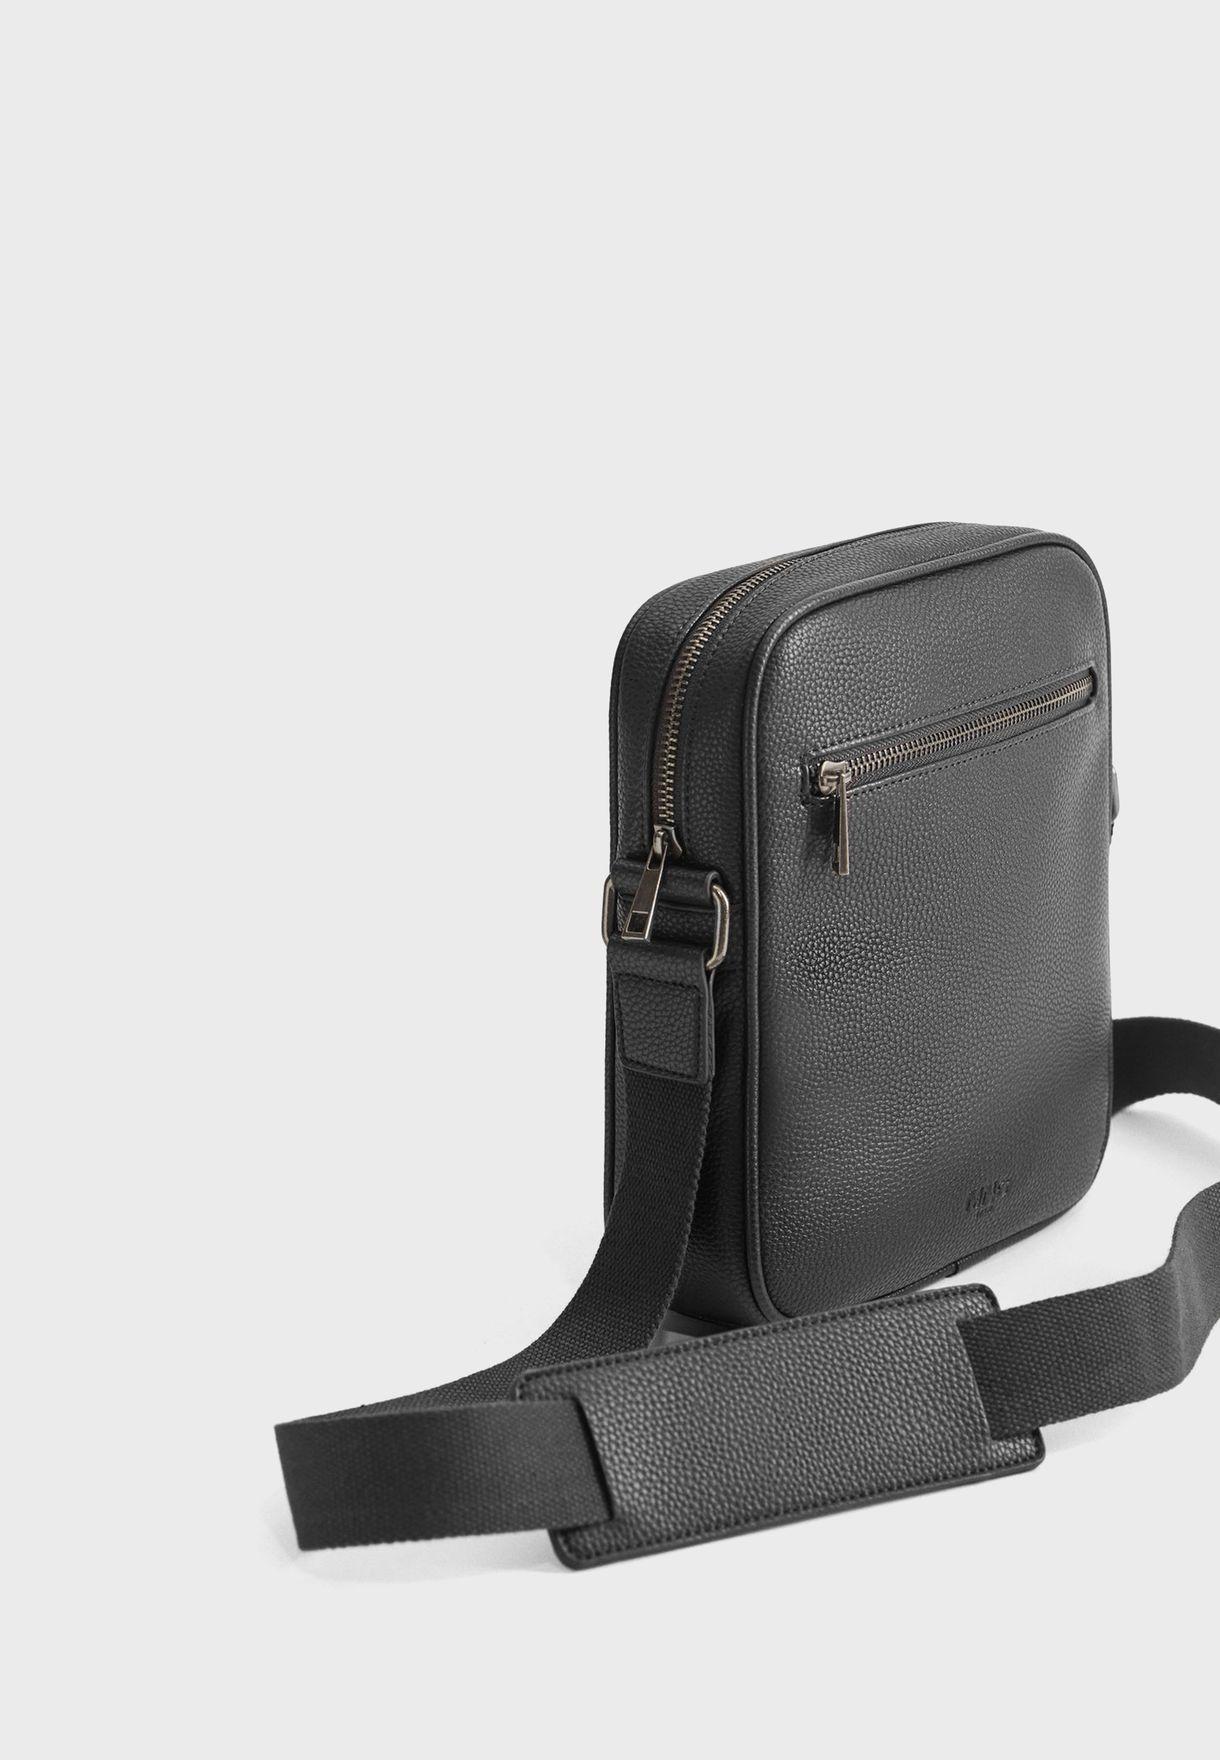 Allday Front Zip Messenger Bag